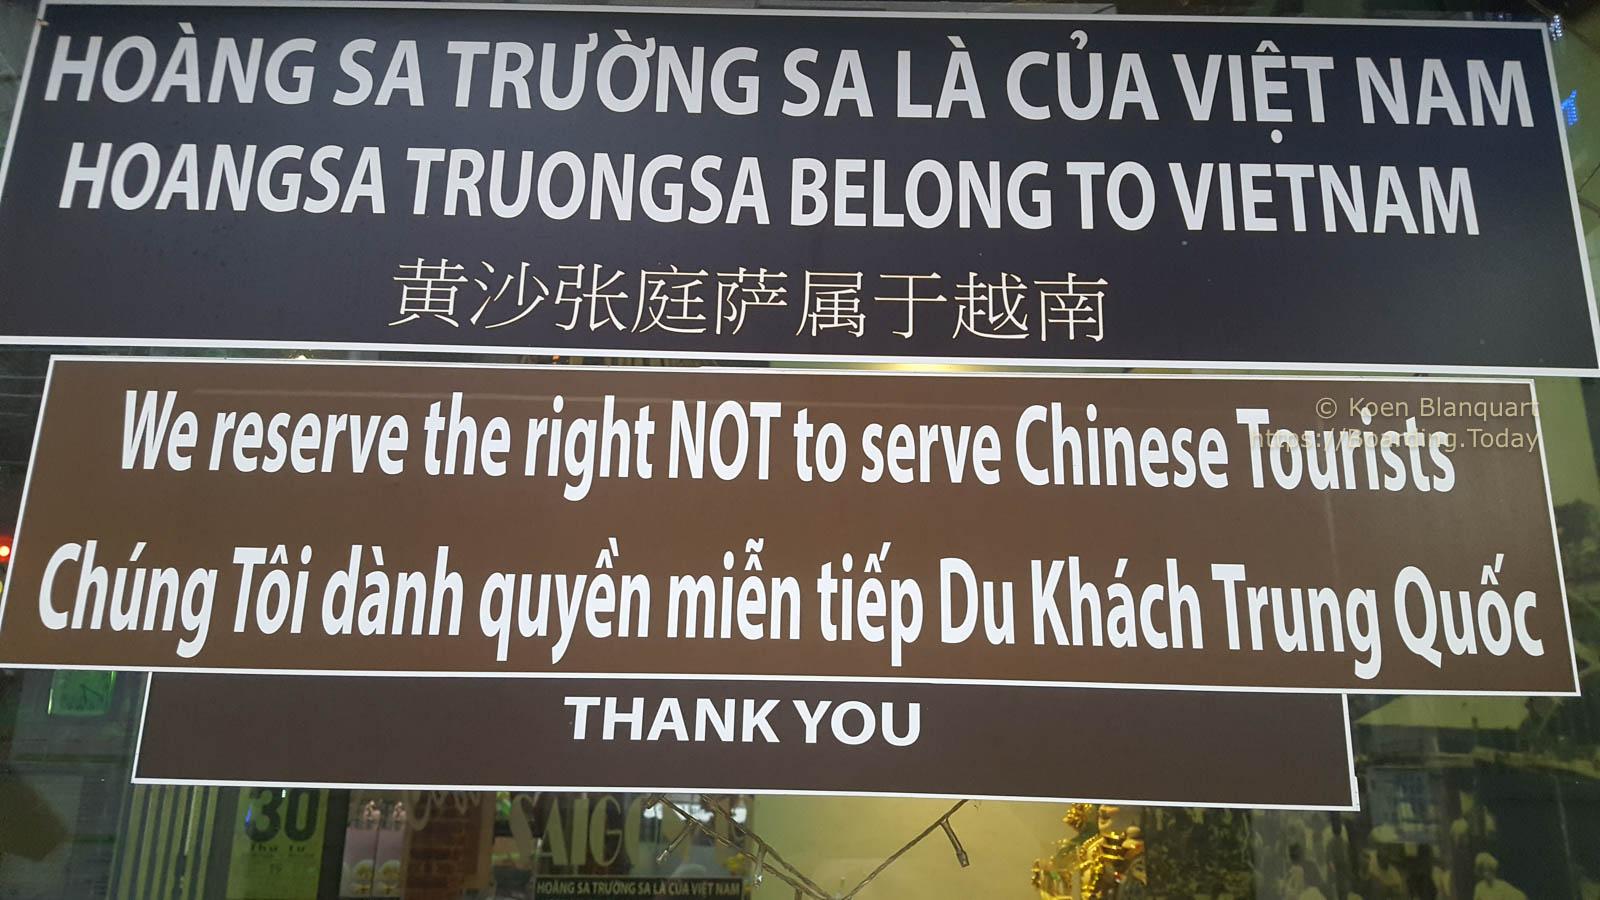 20170124-2017-01-24 17.22.08Ho Chi Minh City, Saigon, Vietnam by Koen Blanquart for Boarding.Today.jpg